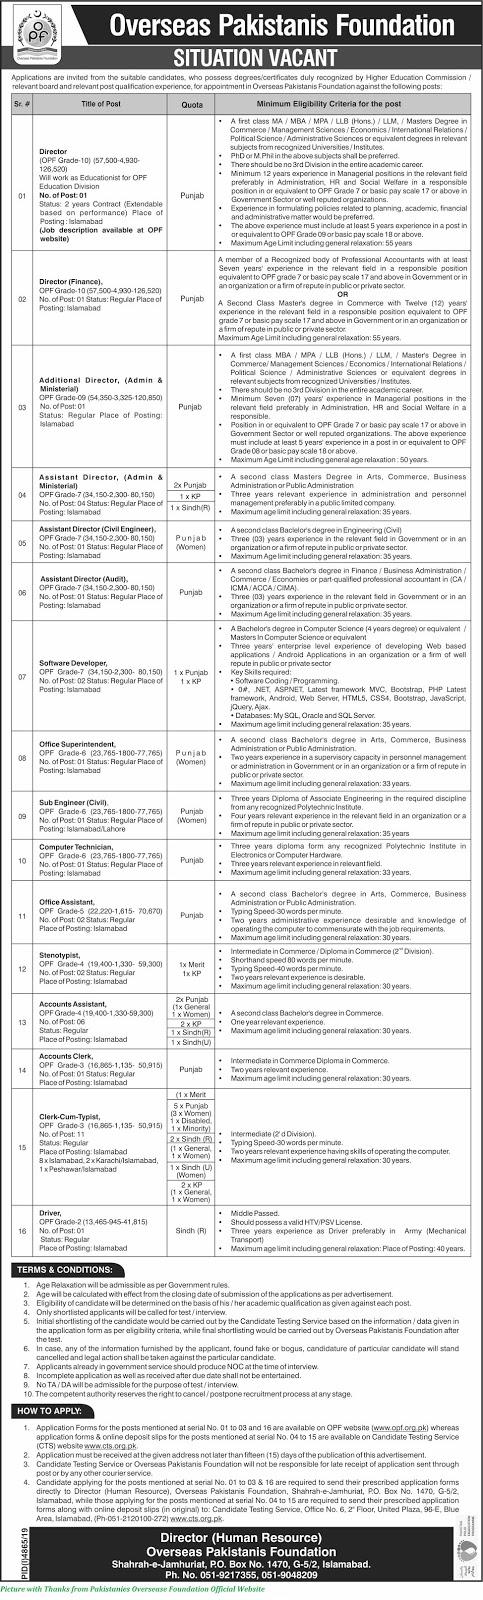 Overseas Pakistanies Foundation Latest Jobs 2020 - Latest Job Opportunities for Males & Females